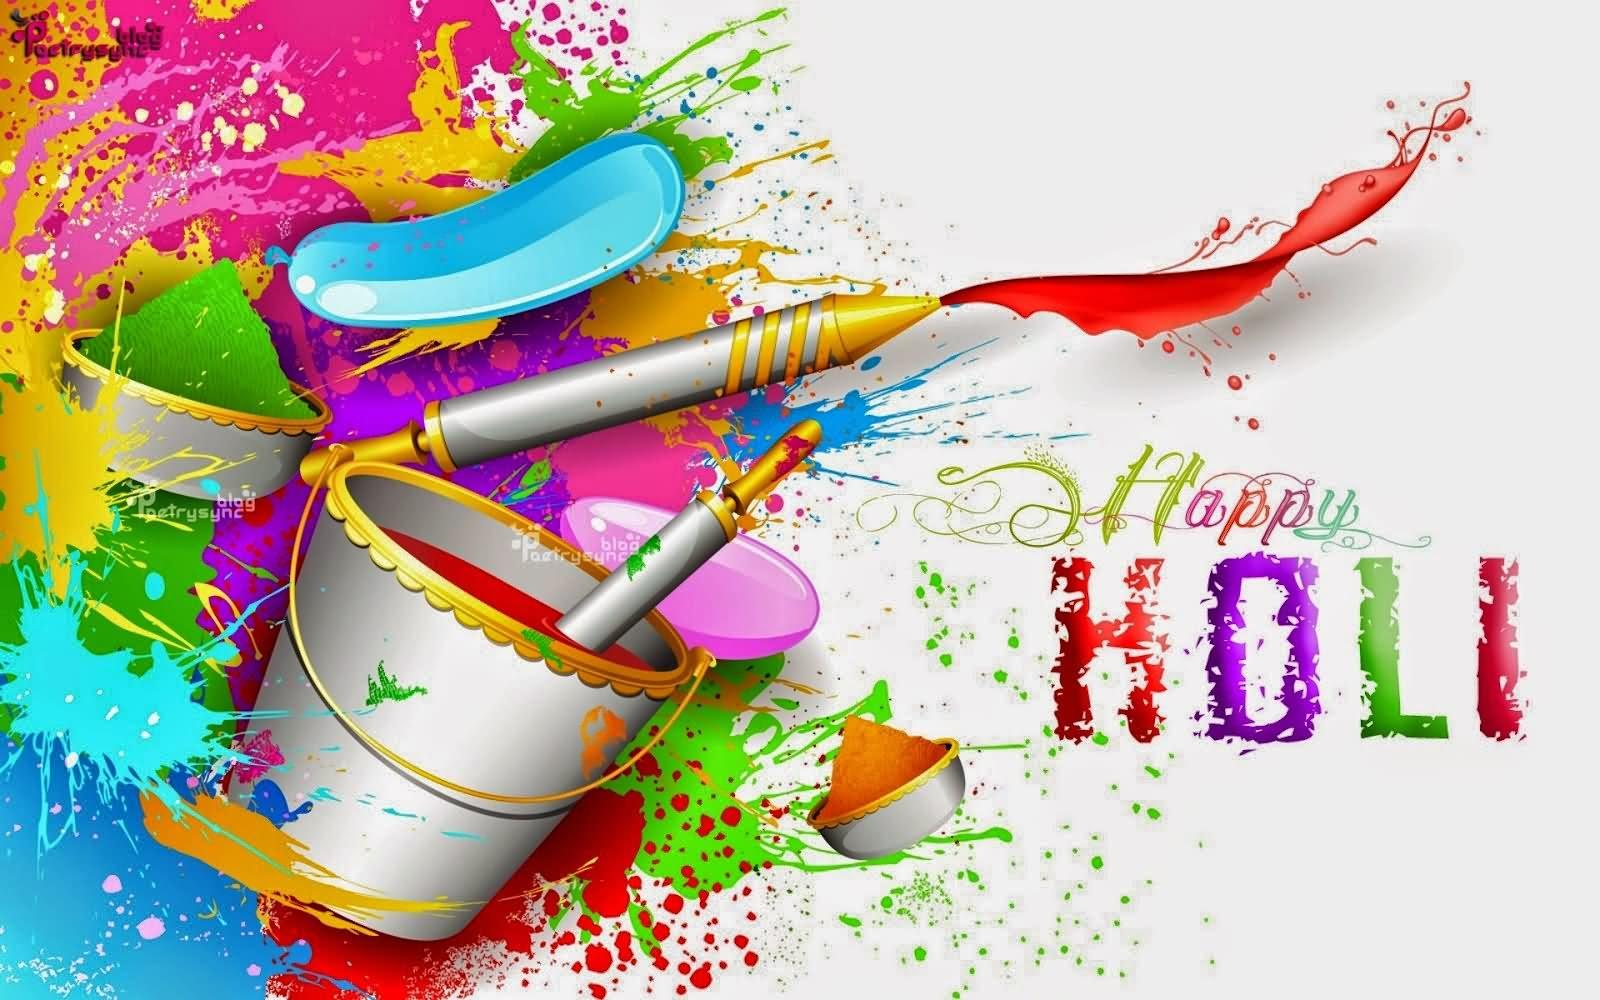 Holi 3d Wallpaper Name Happy Holi Colorful Hd Wallpaper